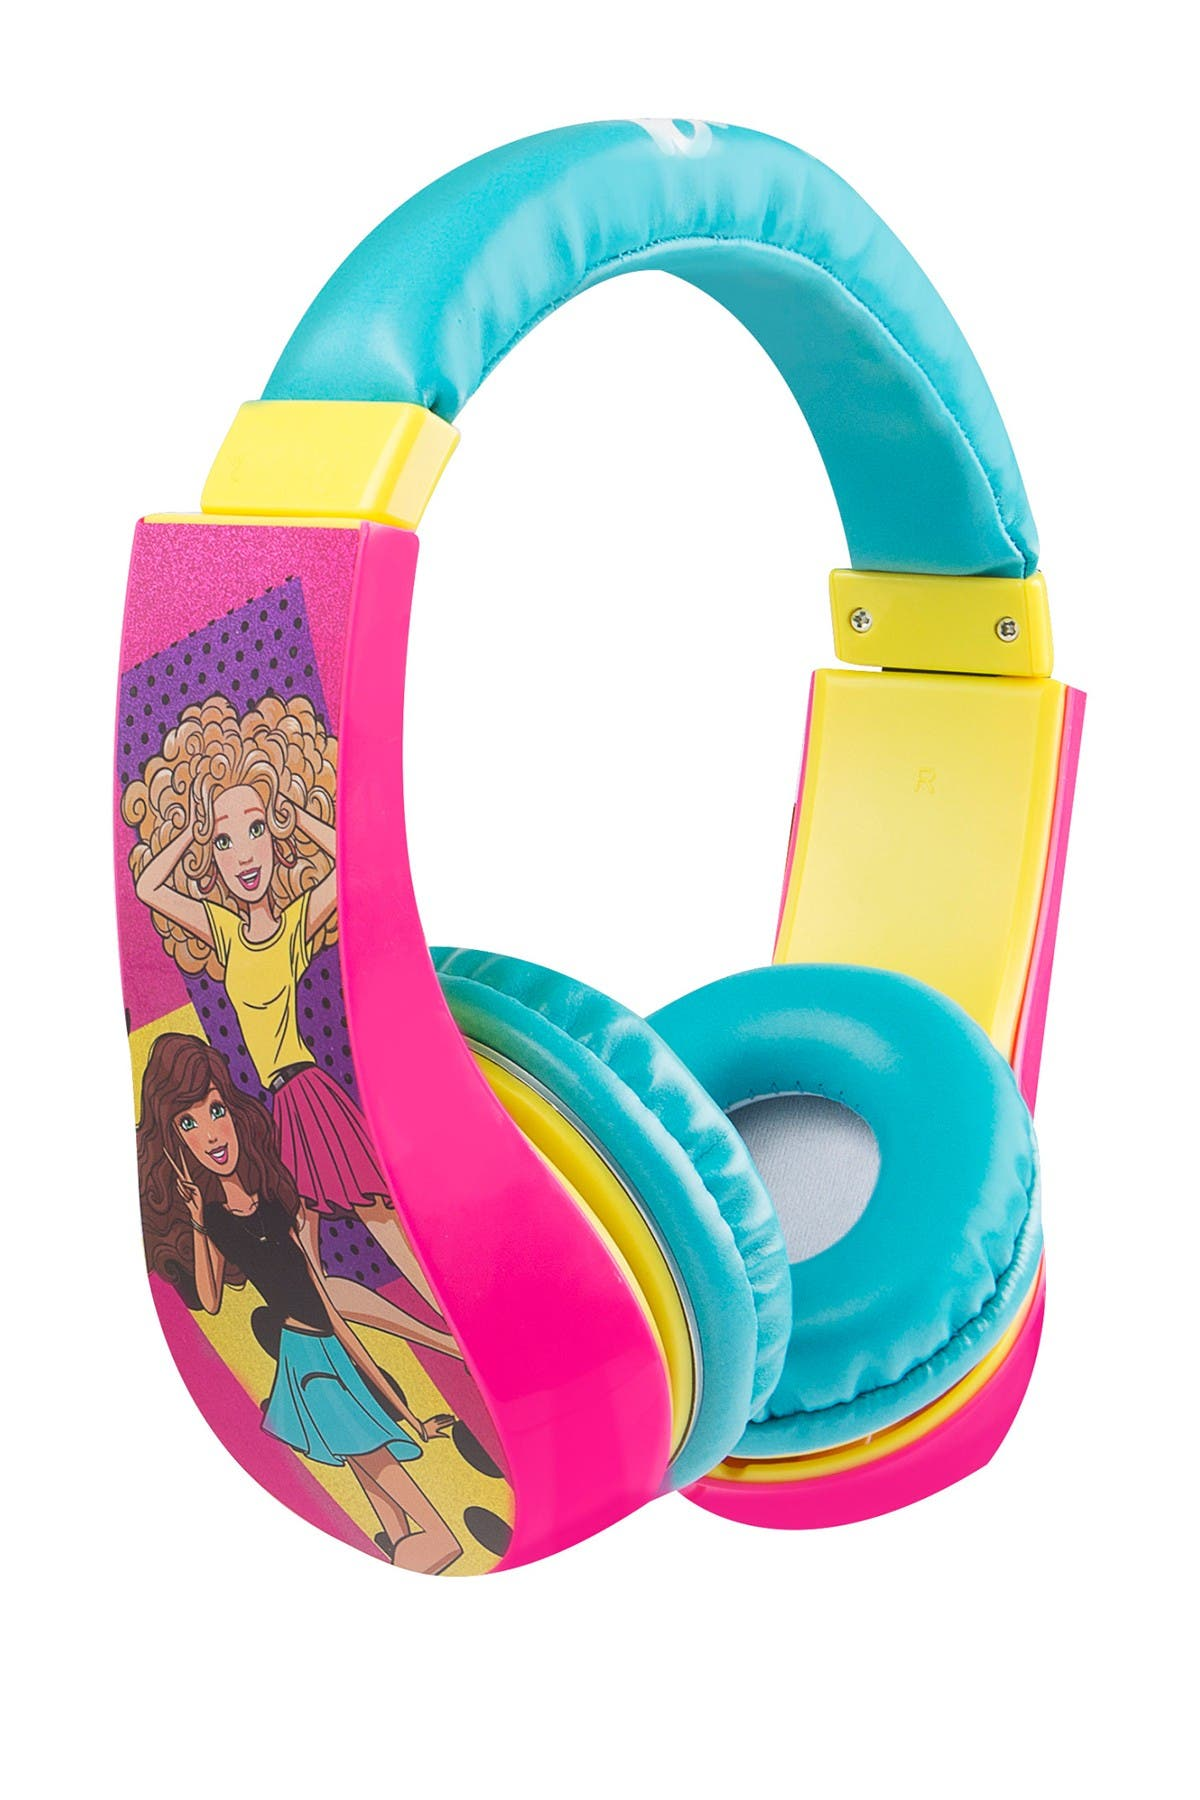 Image of VIVITAR Barbie Kids Safe Headphones